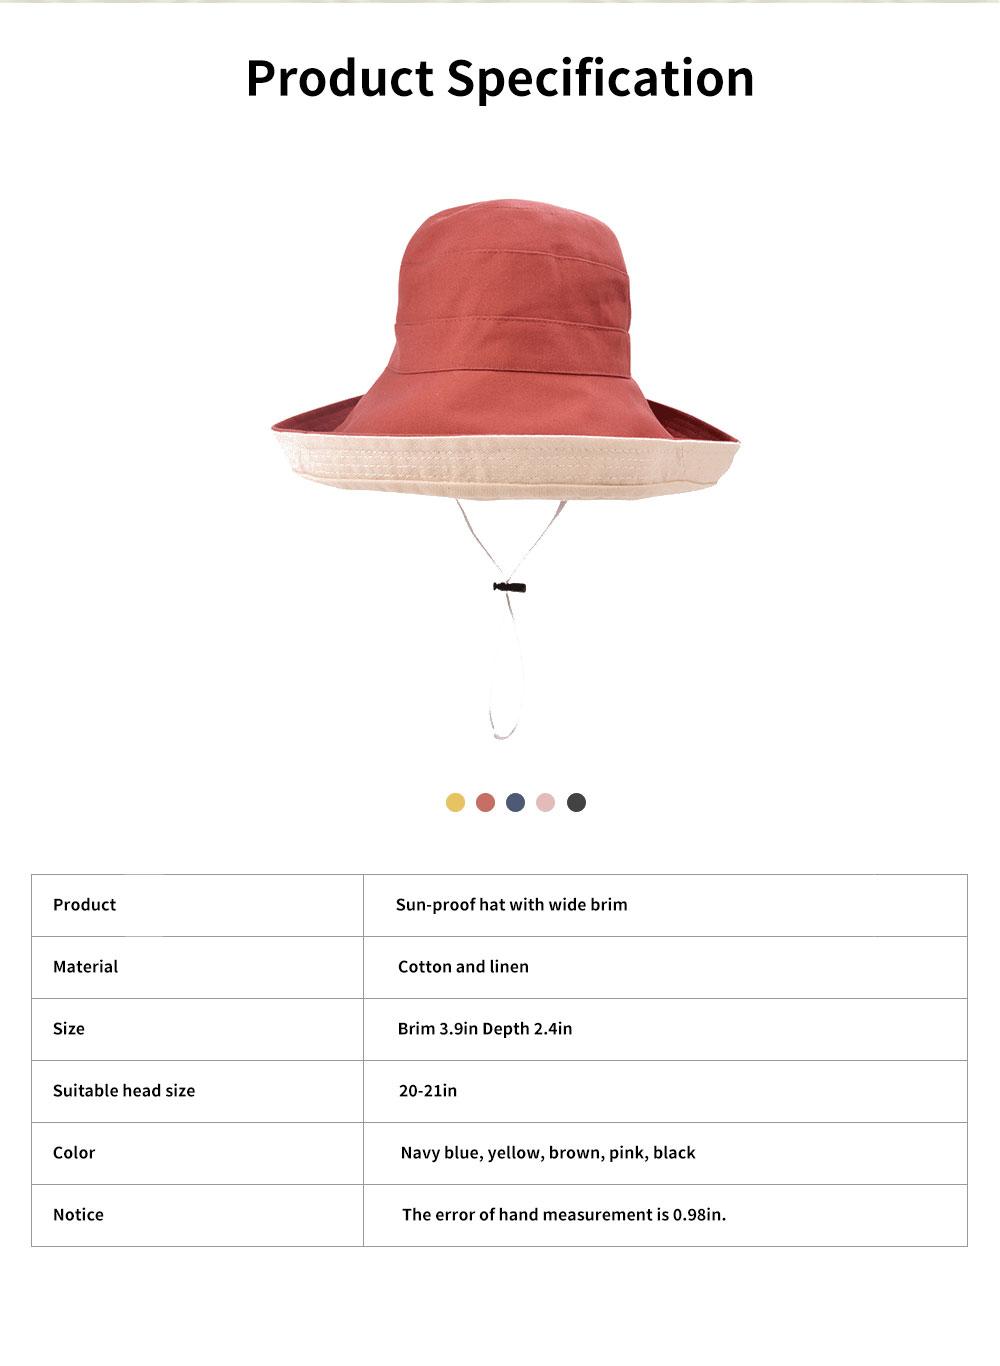 Sun-proof Bucket Hat for Children & Kids Cotton & Linen Spring Summer Sun Hat for Girls & Boys 6